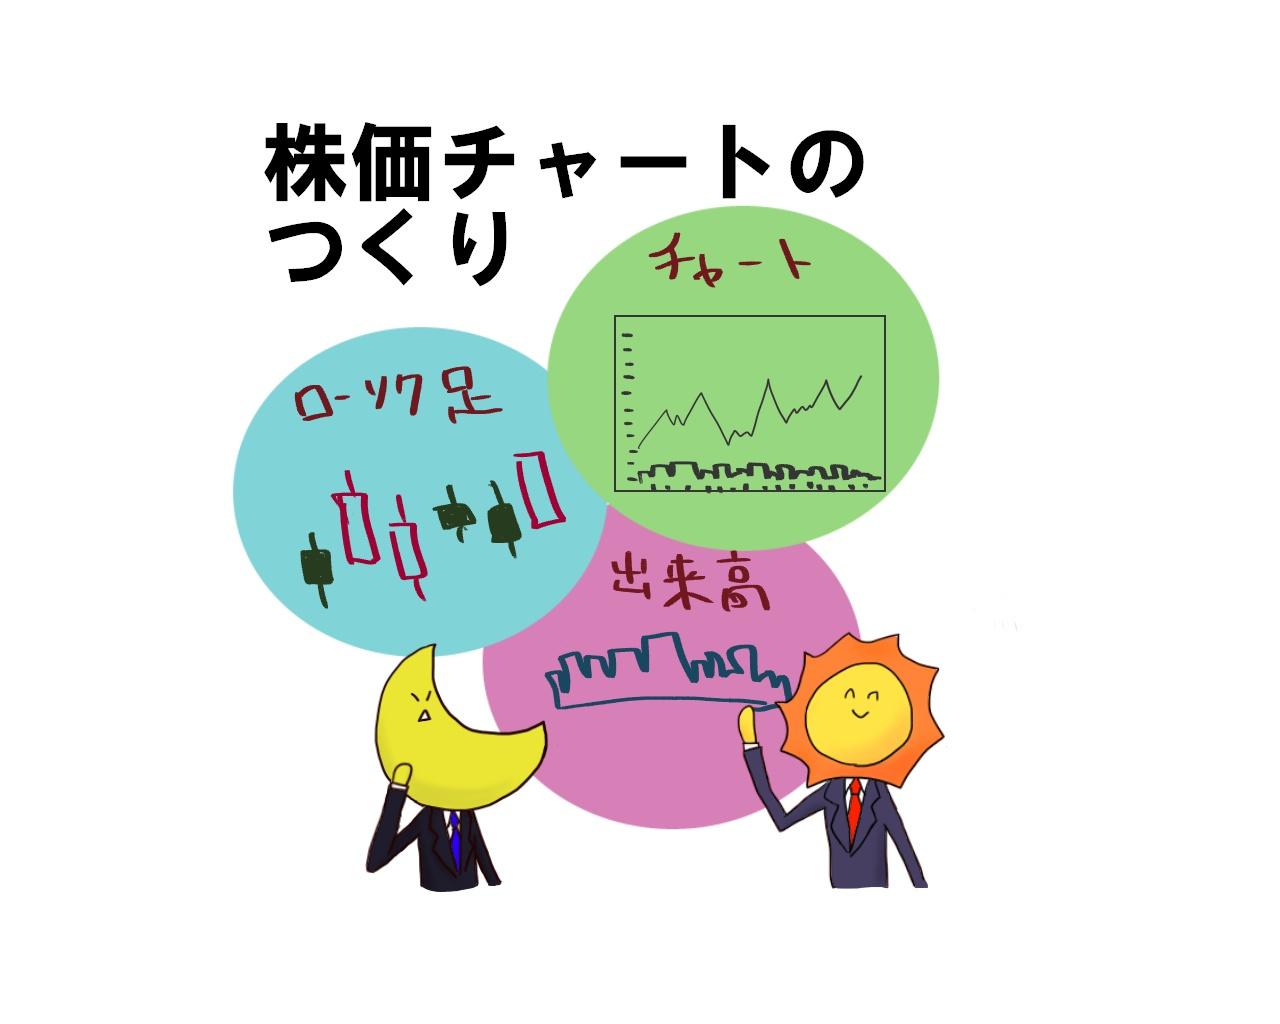 201701111248426bb.jpg